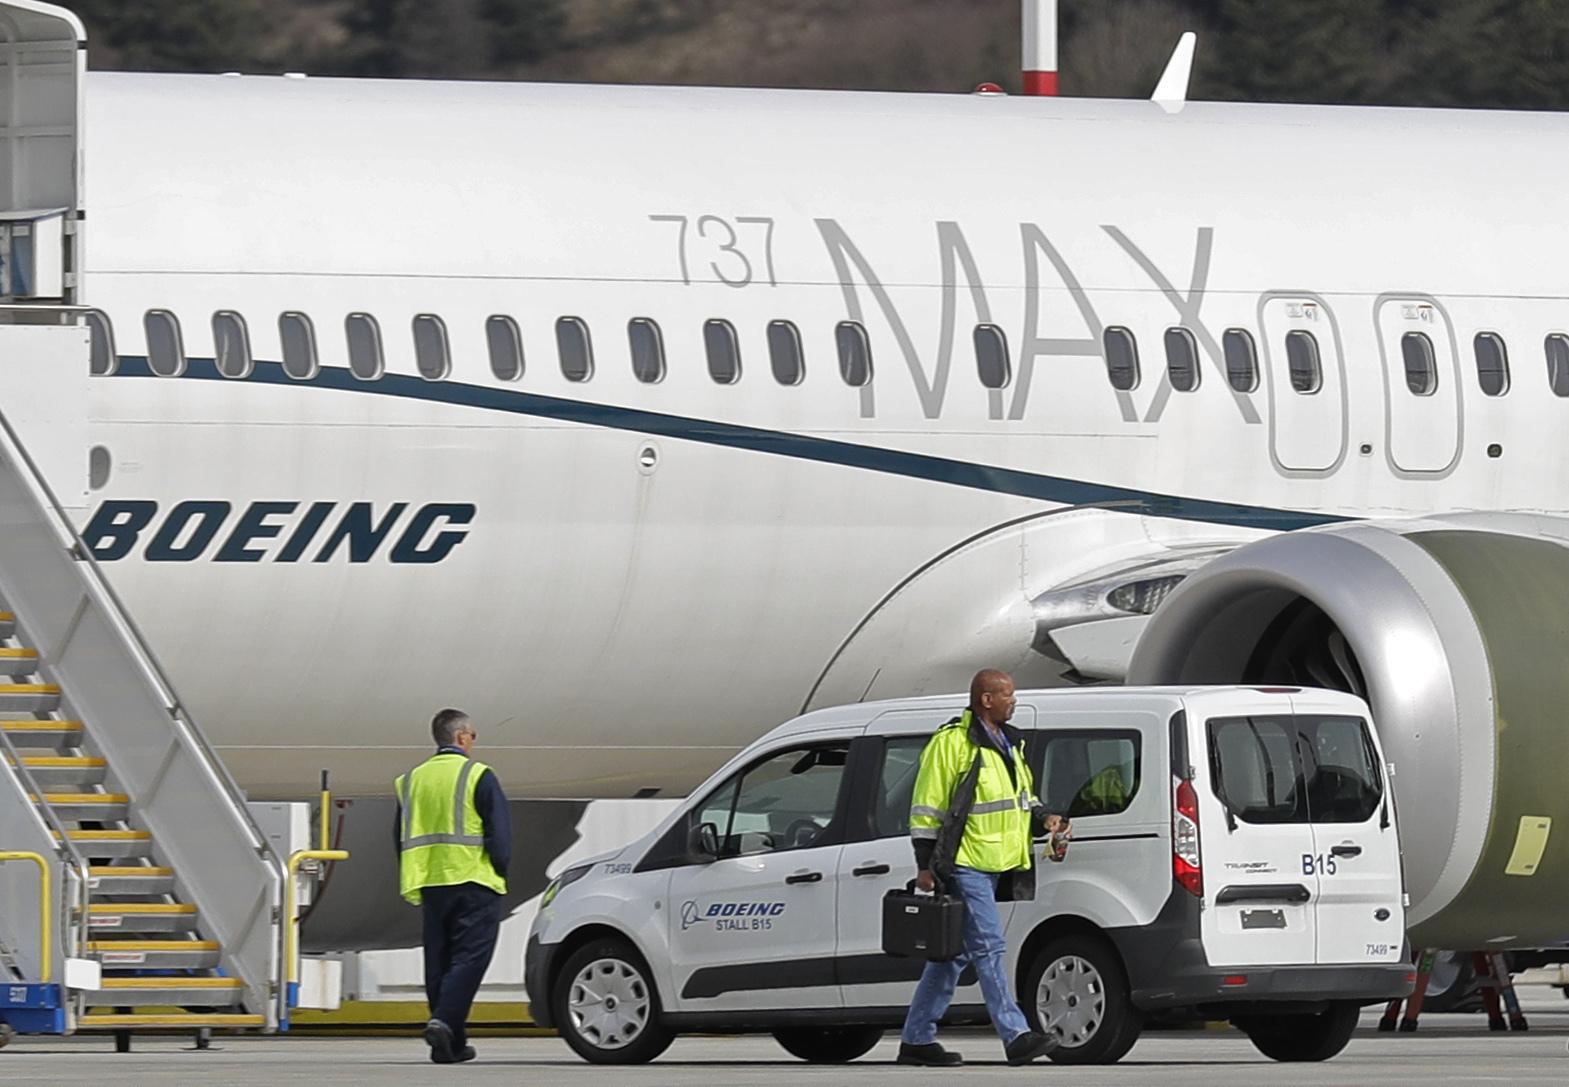 Boeing_Ethiopia_Plane_Crash_15073-159532.jpg19645279